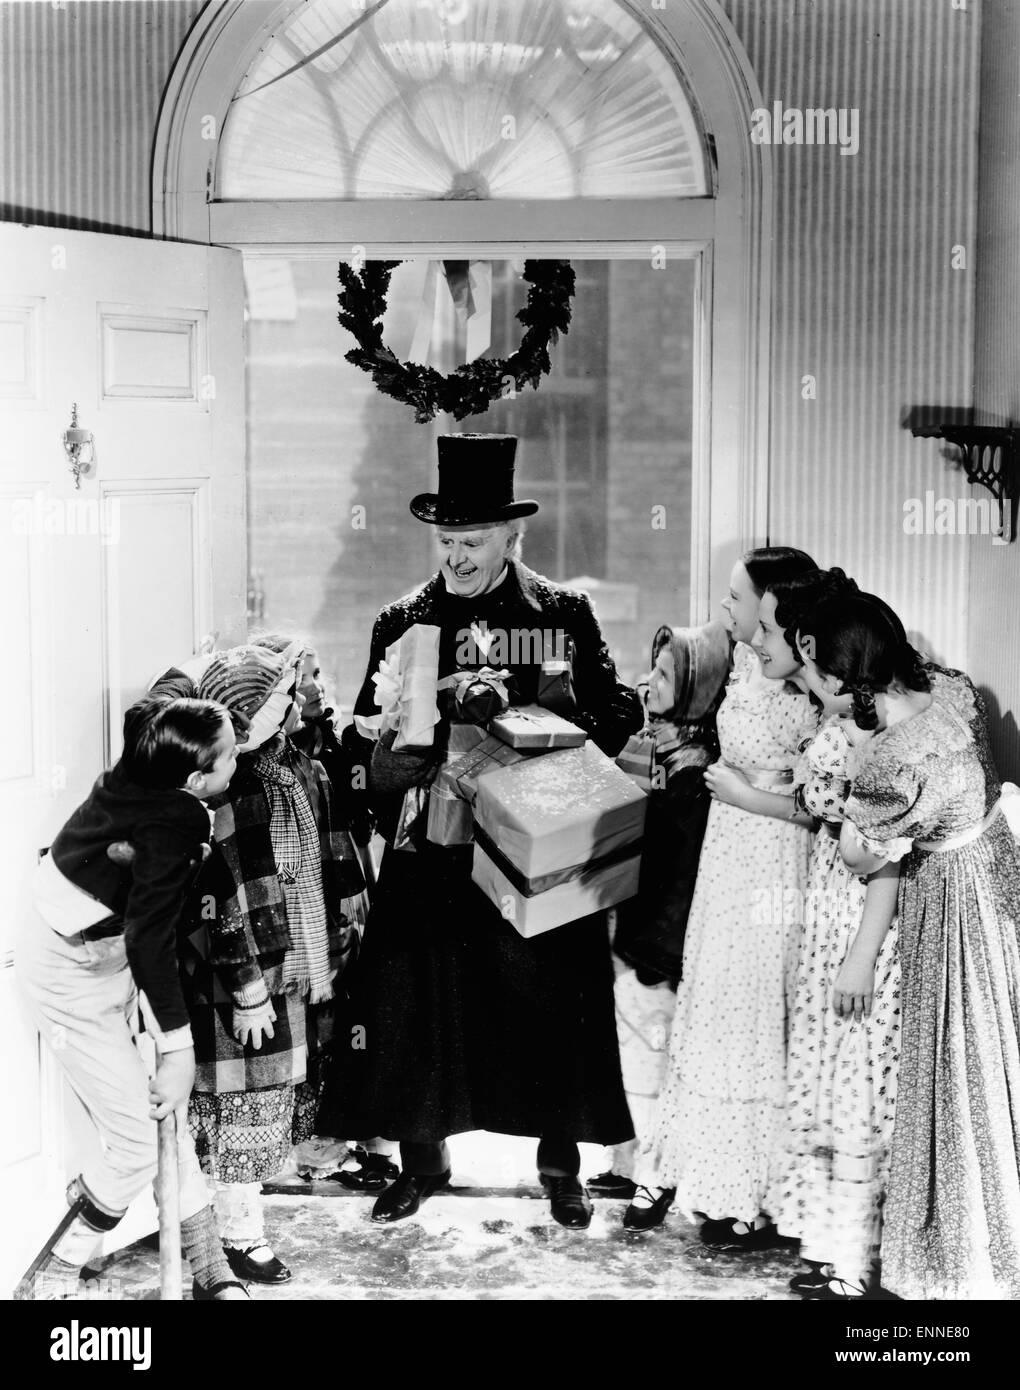 A Christmas Carol, USA 1938, Regie: Edwin L. Marin, Monia: Reginald ...